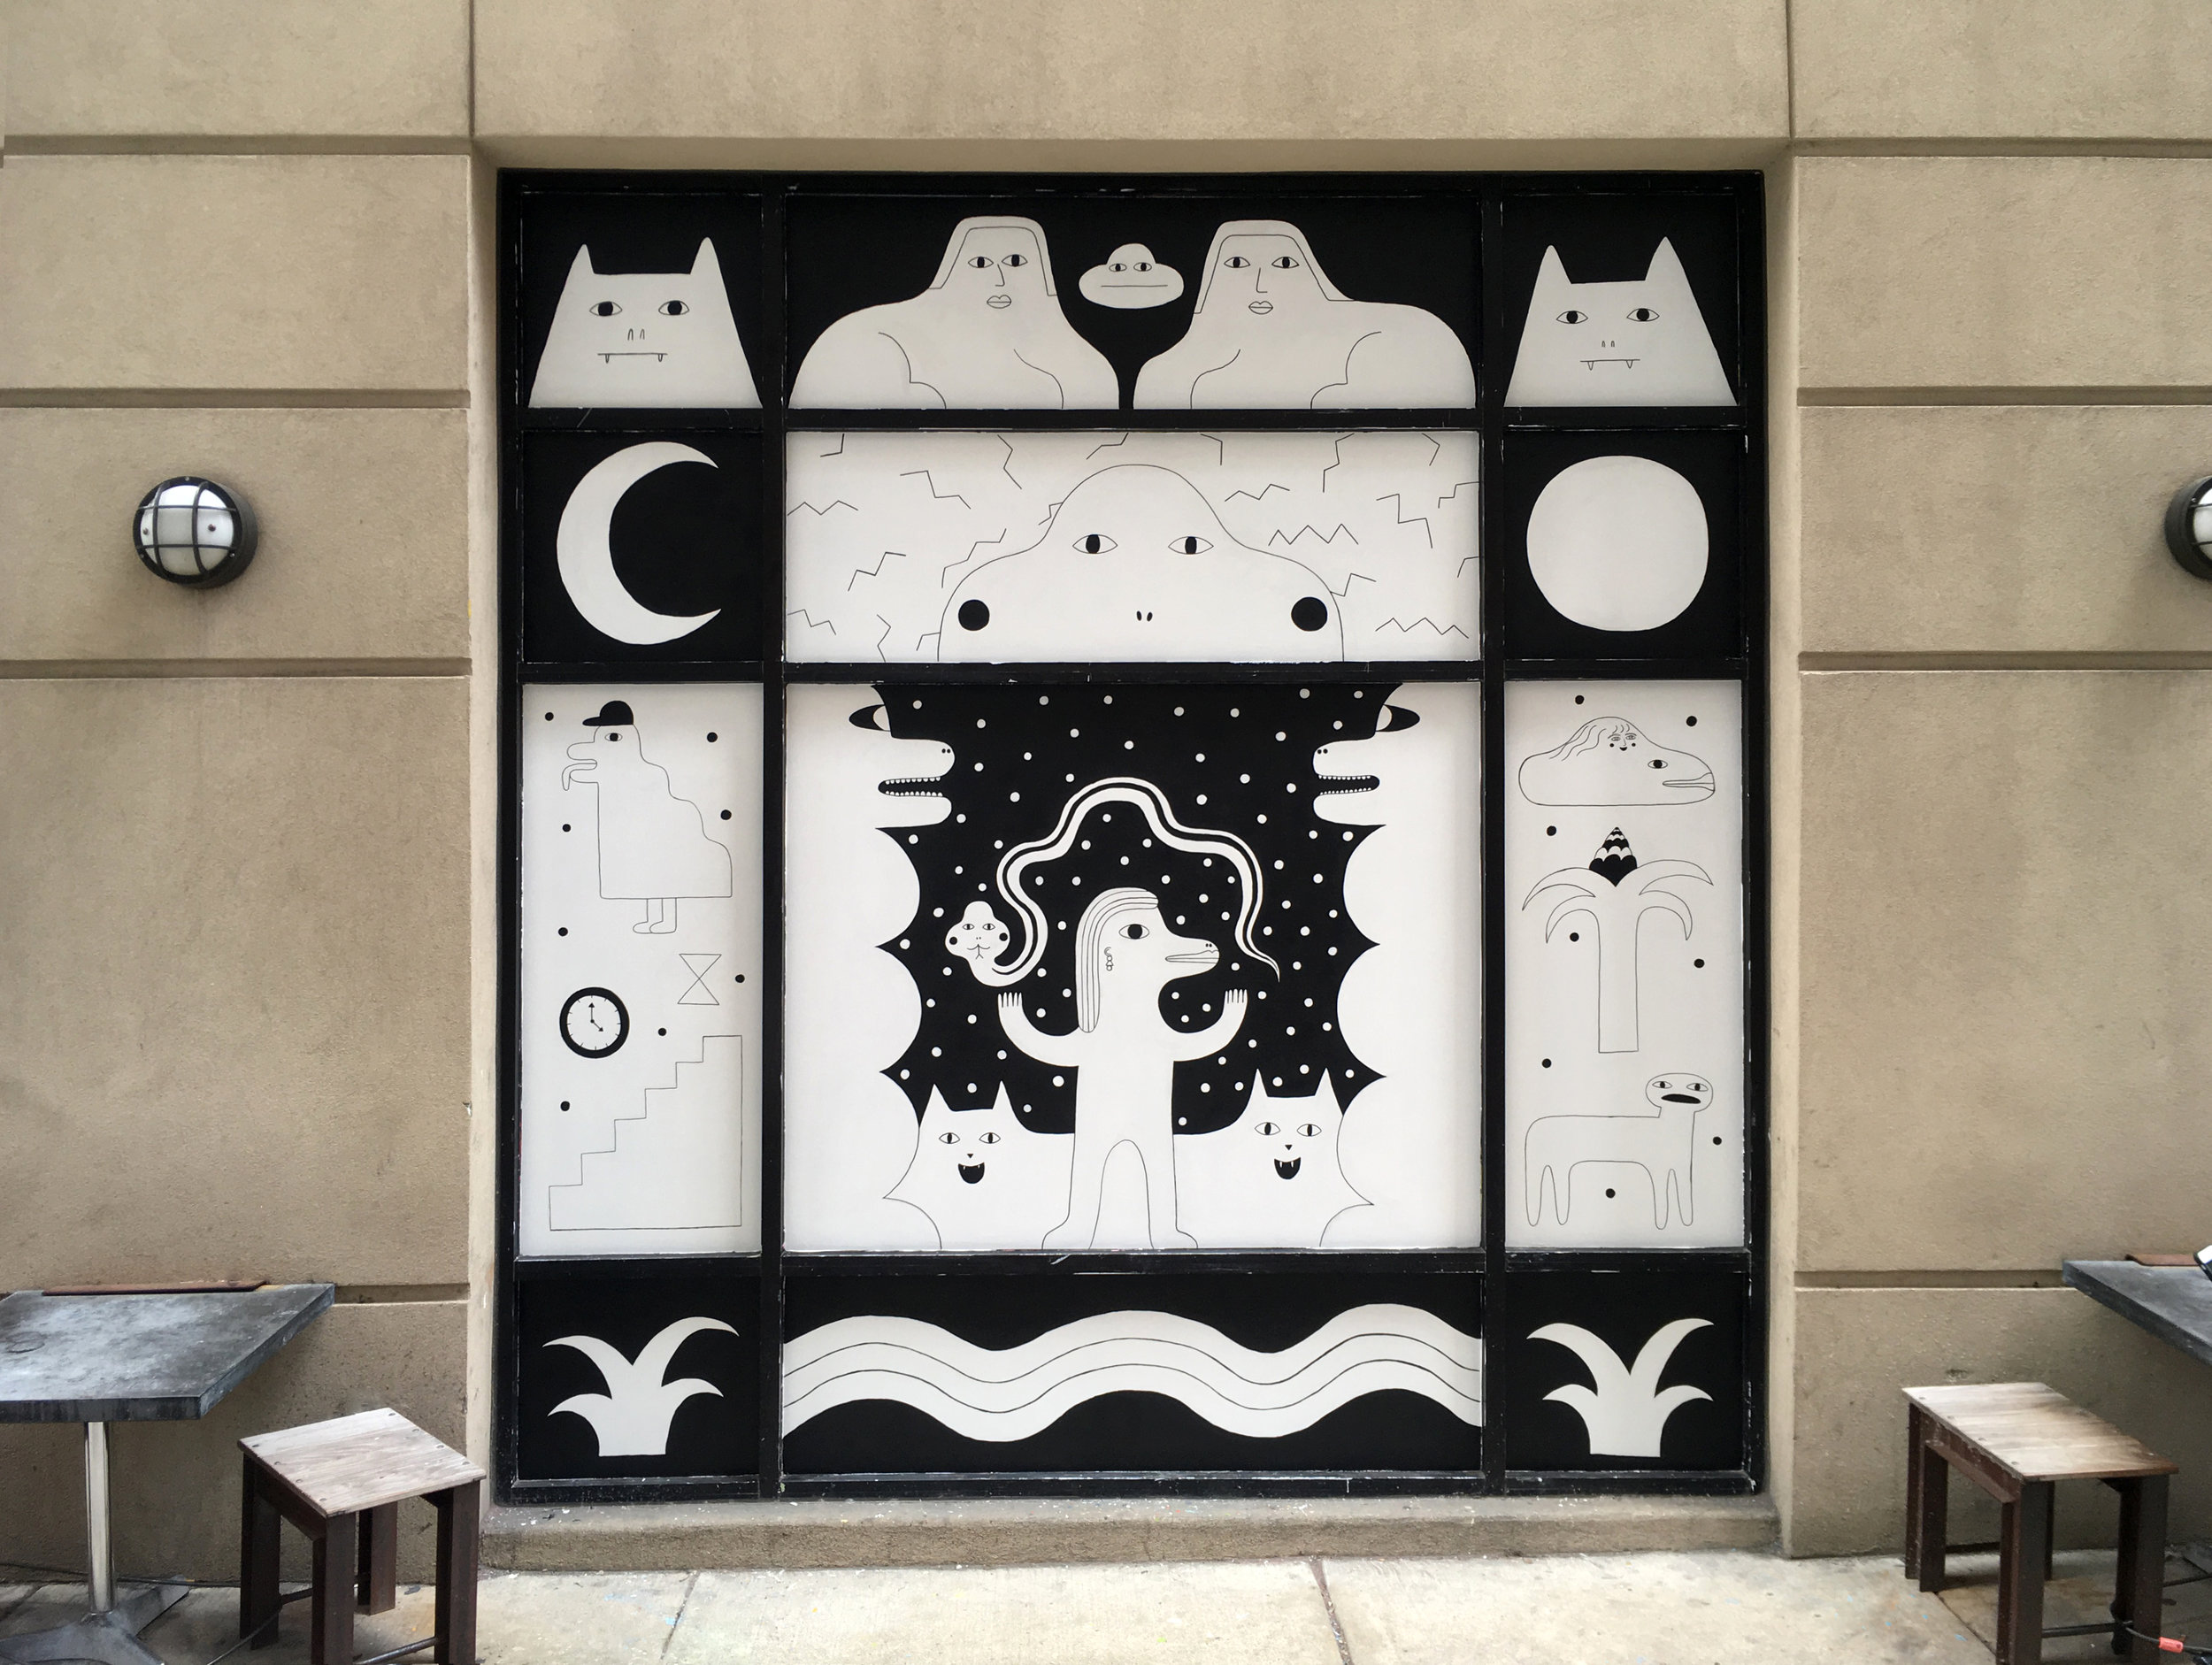 Mural on glass, Elixr Coffee, Philadelphia, PA 2016